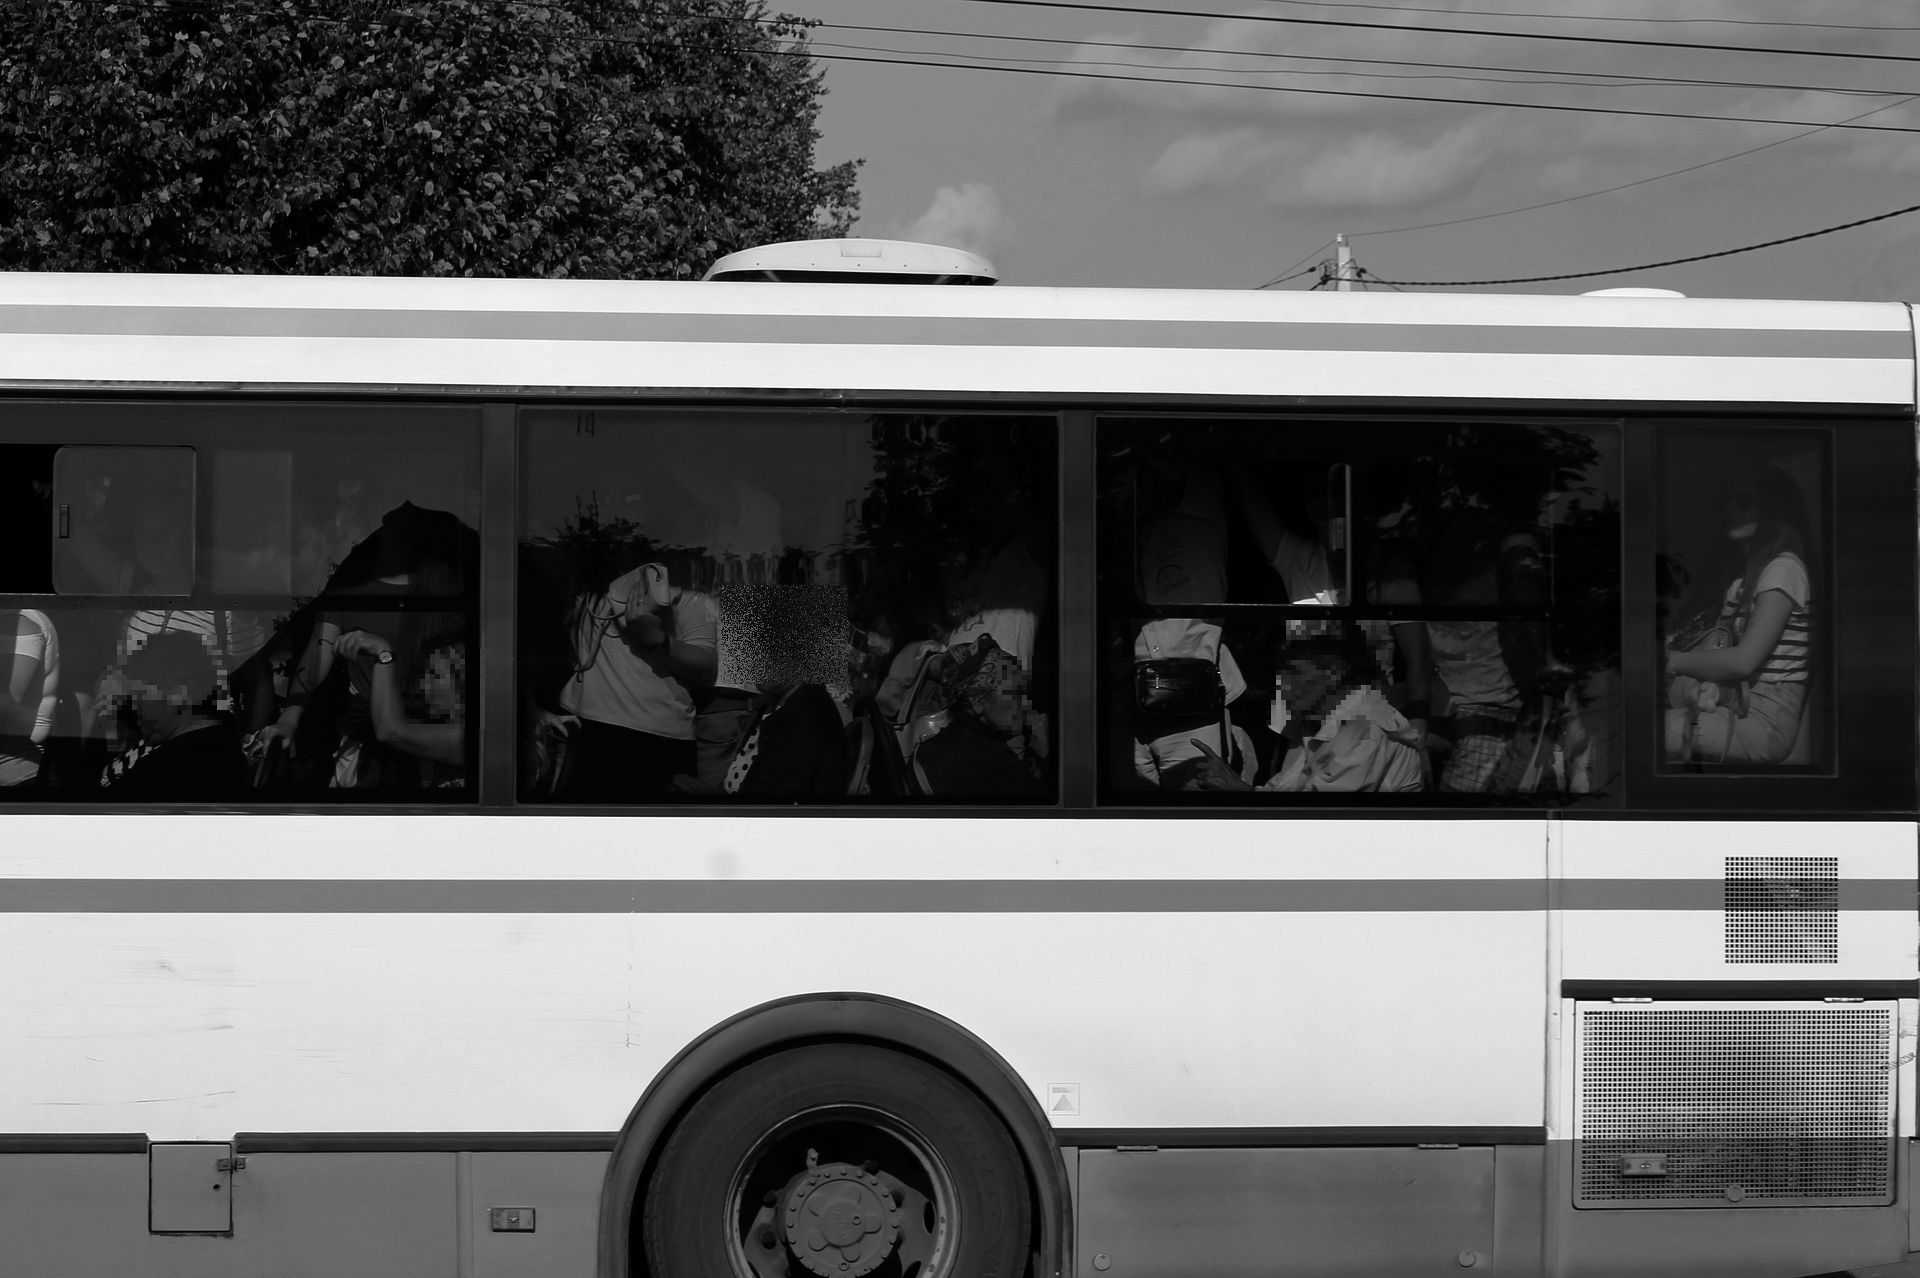 Zsúfolt busz